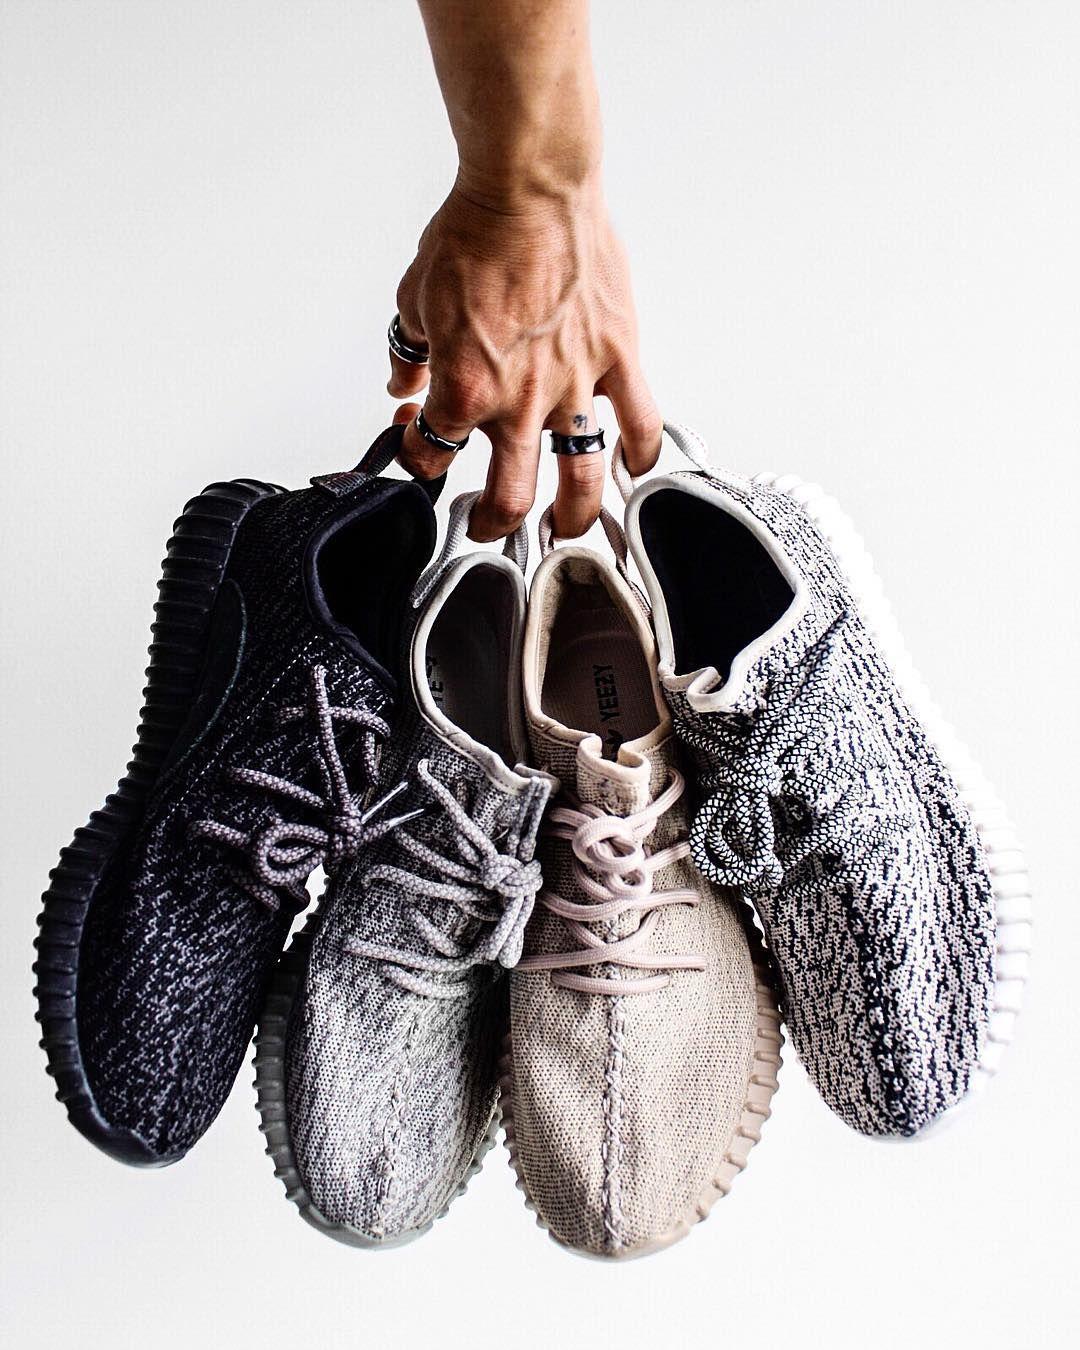 What S Your Favorite Yeezy By Nanonanin Adidas Boost Grailify Hiphop Hypebeast Igsneakercommunity Kanyewest Kicks Kicksonfire Kickstagram Kimk